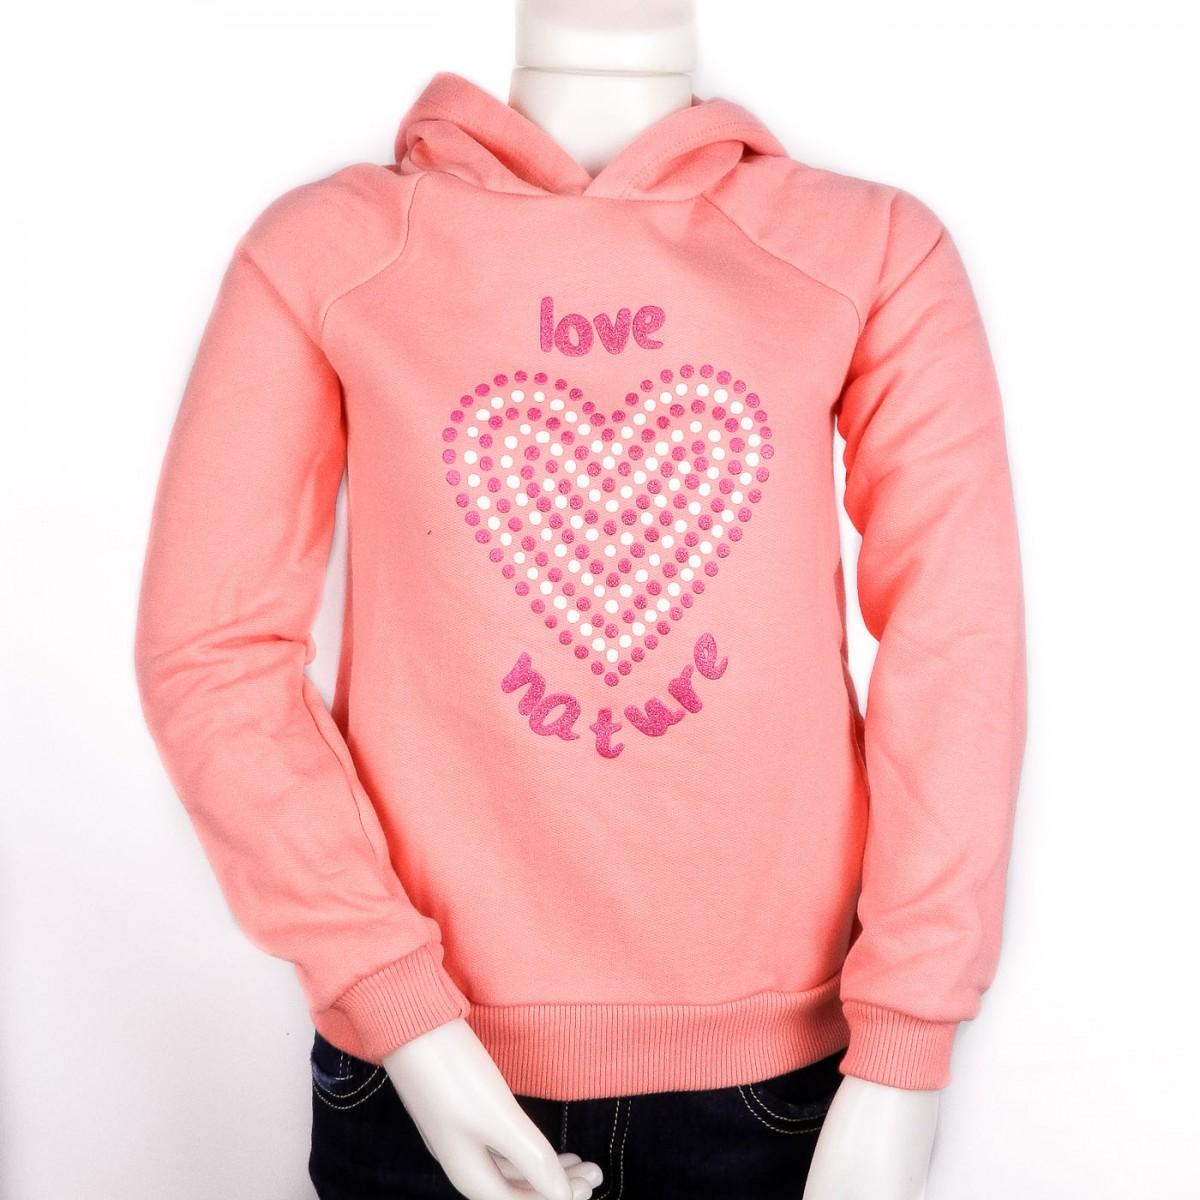 af624ad1e0 Bizz Store - Moletom Infantil Feminino Hering Kids Rosa C  Capuz